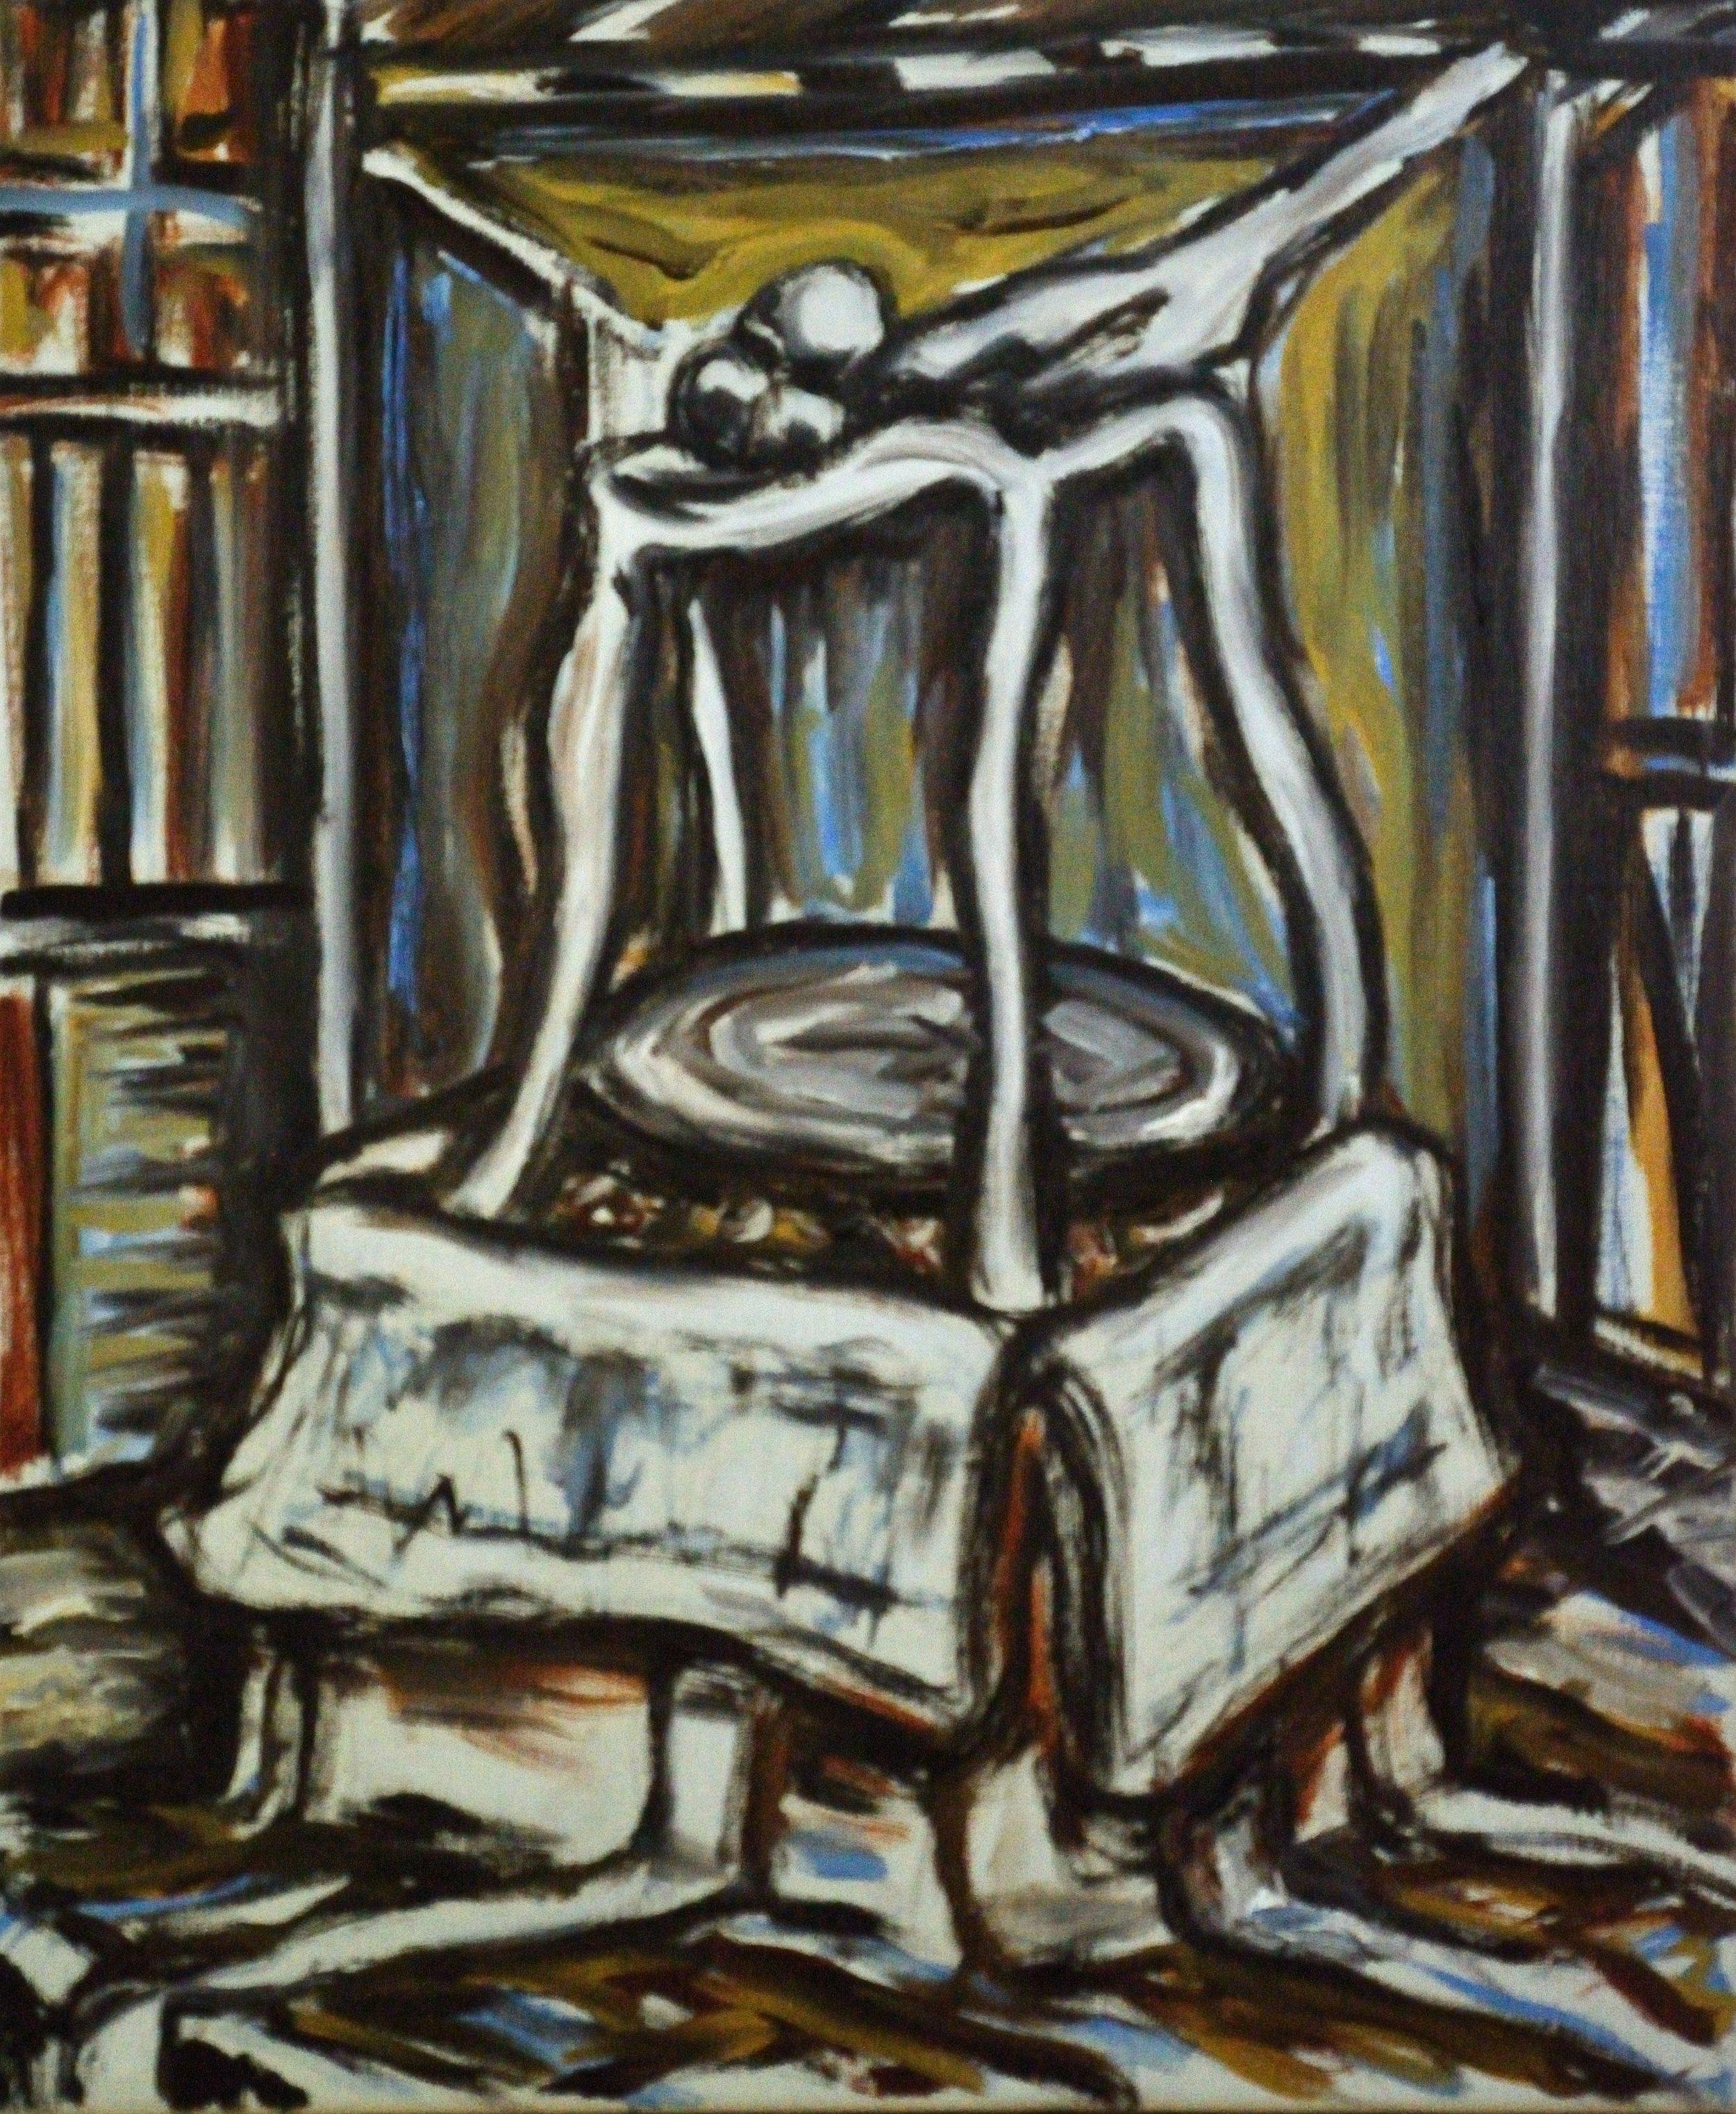 MDPCD, 60x50cm, oil on canvas